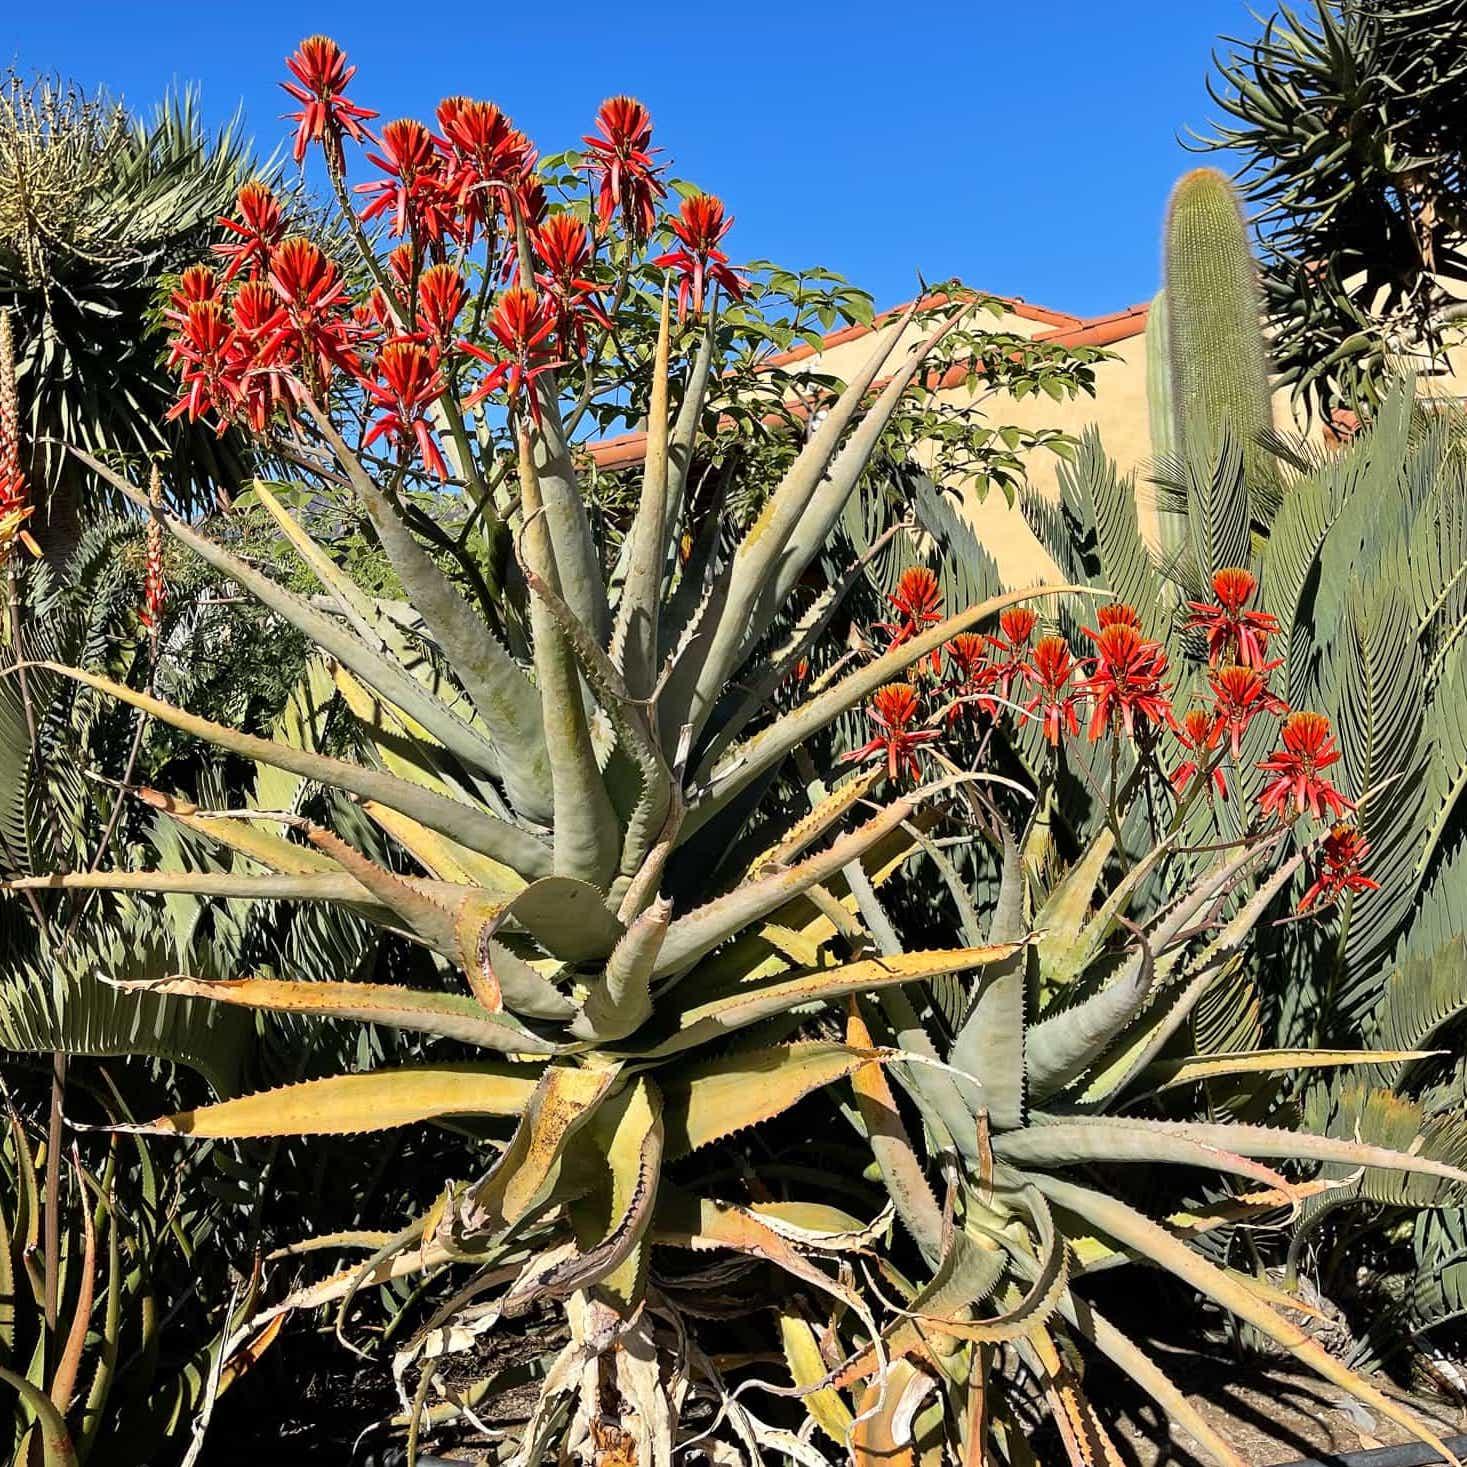 Aloe volkensii